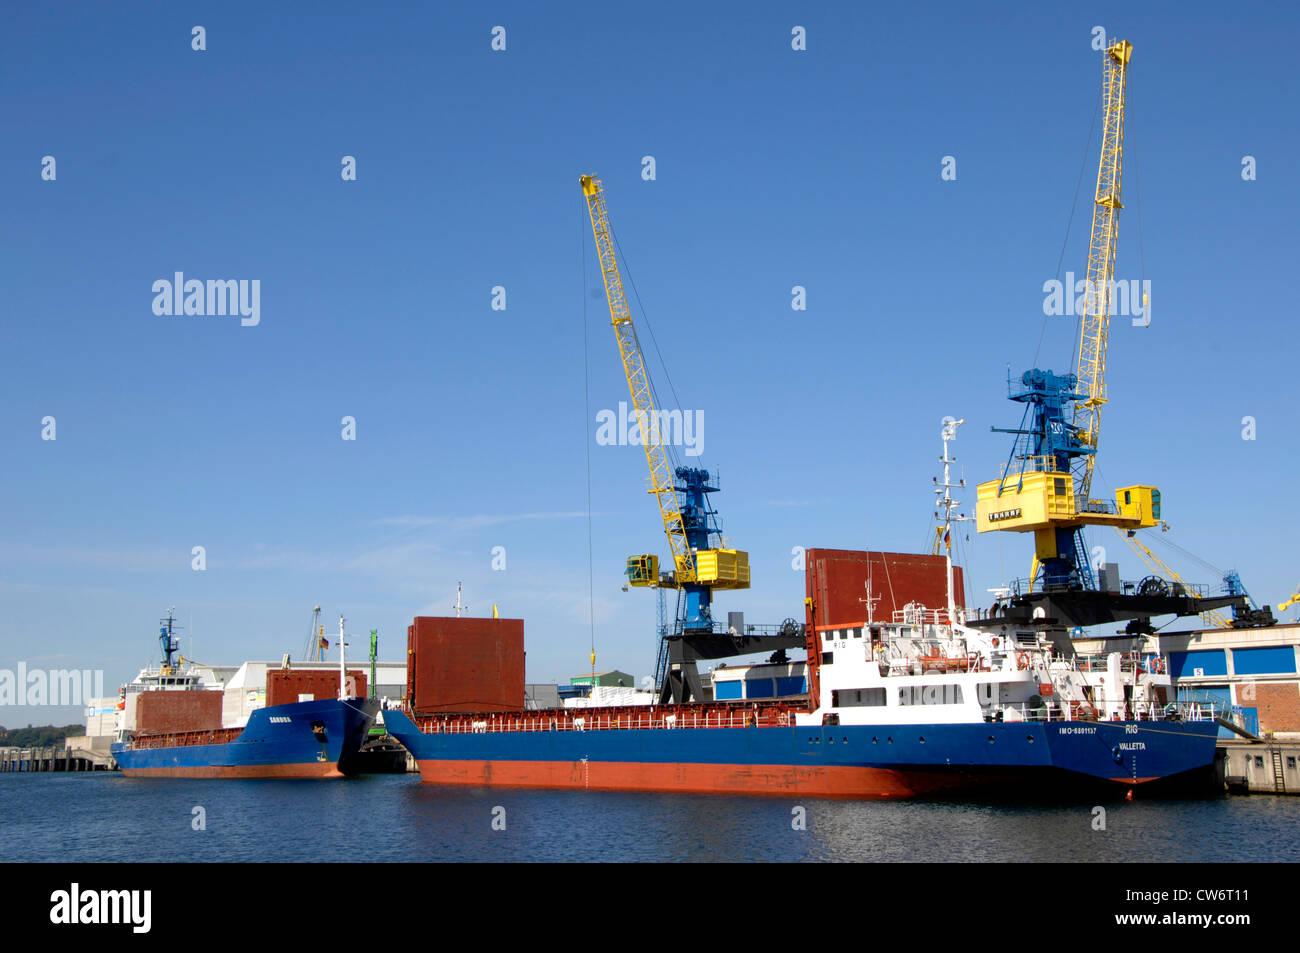 transport ships in Wismar harbour, Germany, Mecklenburg-Western Pomerania, Wismar - Stock Image